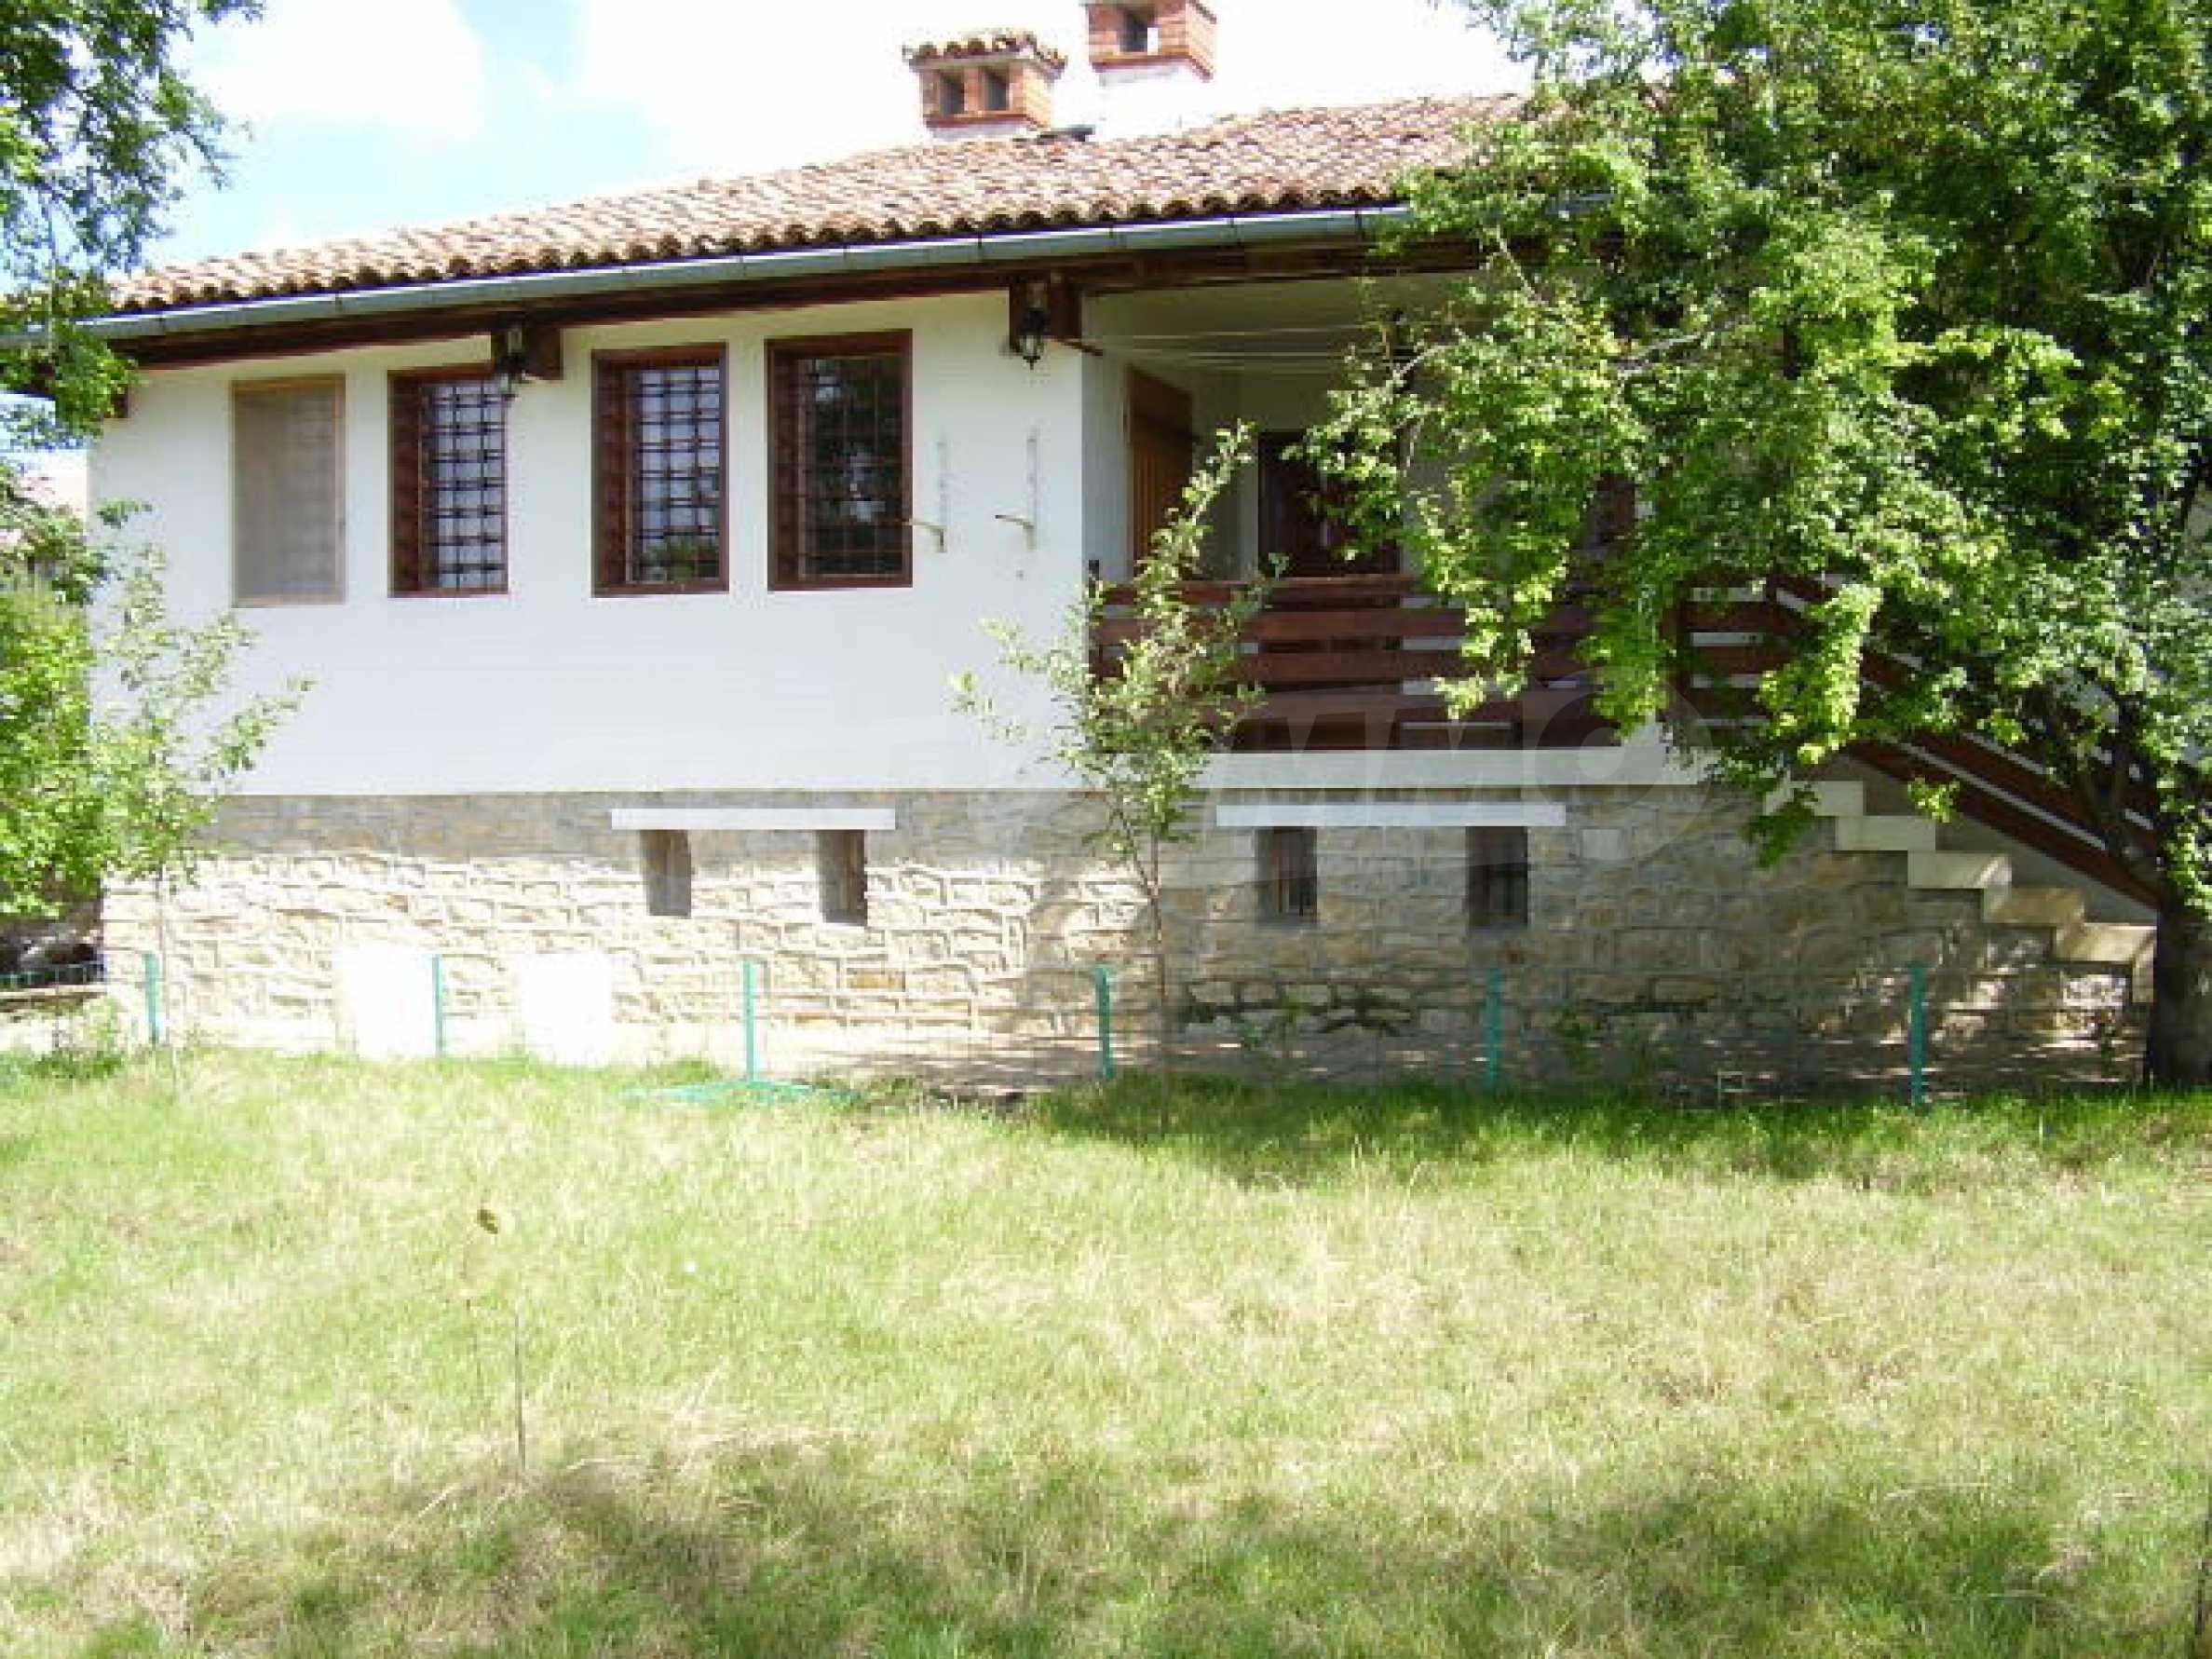 Renoviertes Haus nur 3 km von Veliko Tarnovo entfernt